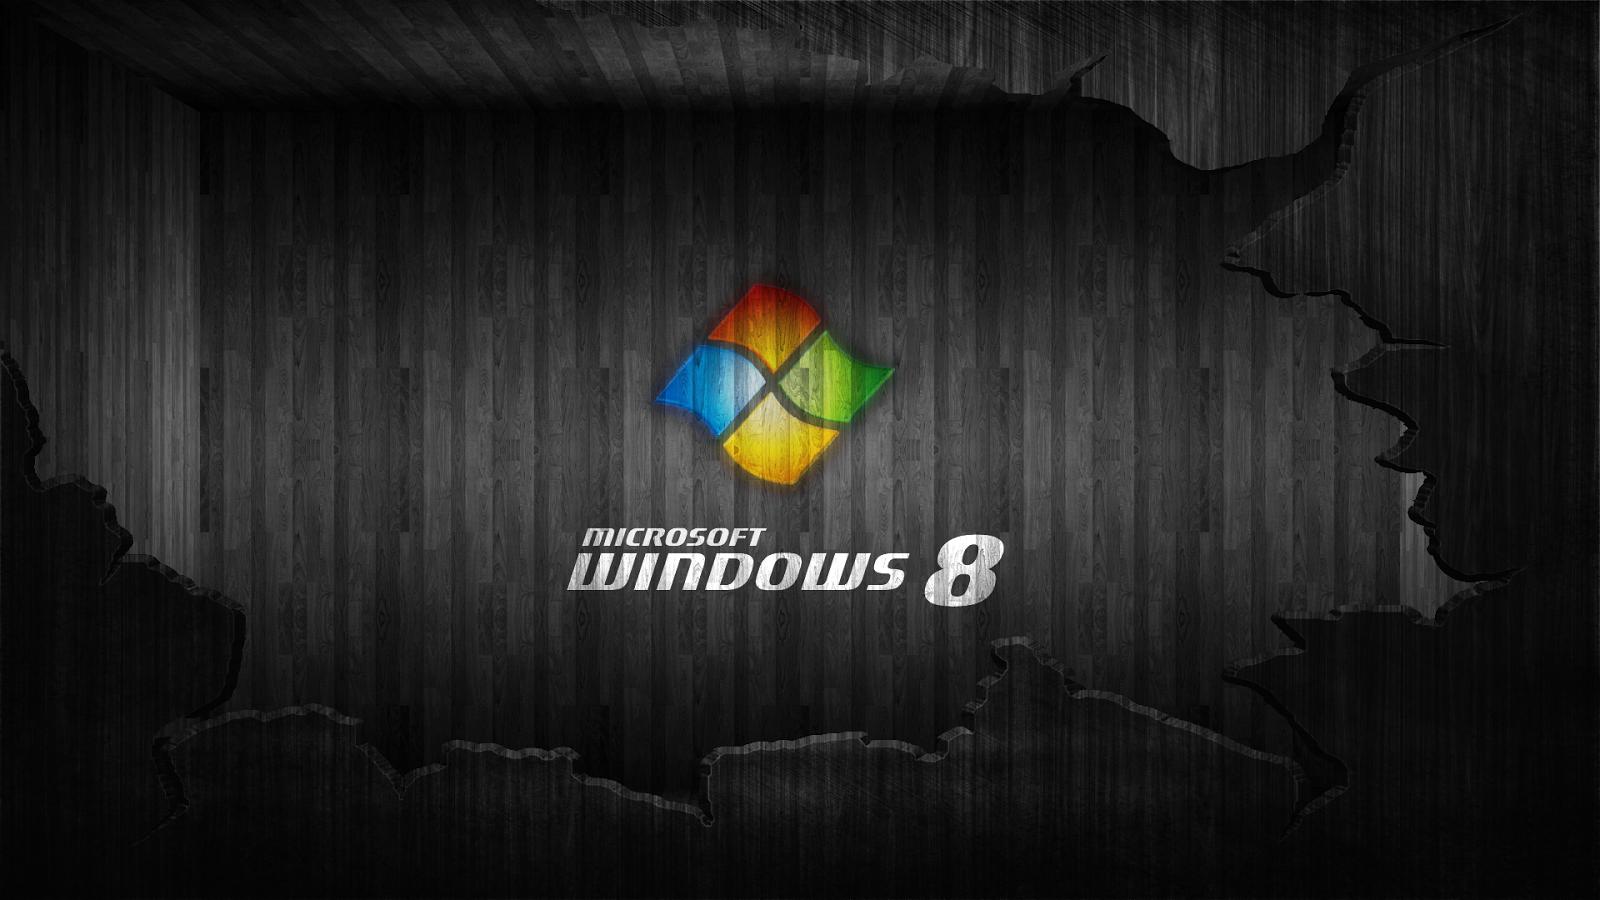 Windows 8 full screen picsmicrosoft windowswallpapers of windows windows 8 full screen picsmicrosoft windowswallpapers of windows thecheapjerseys Choice Image